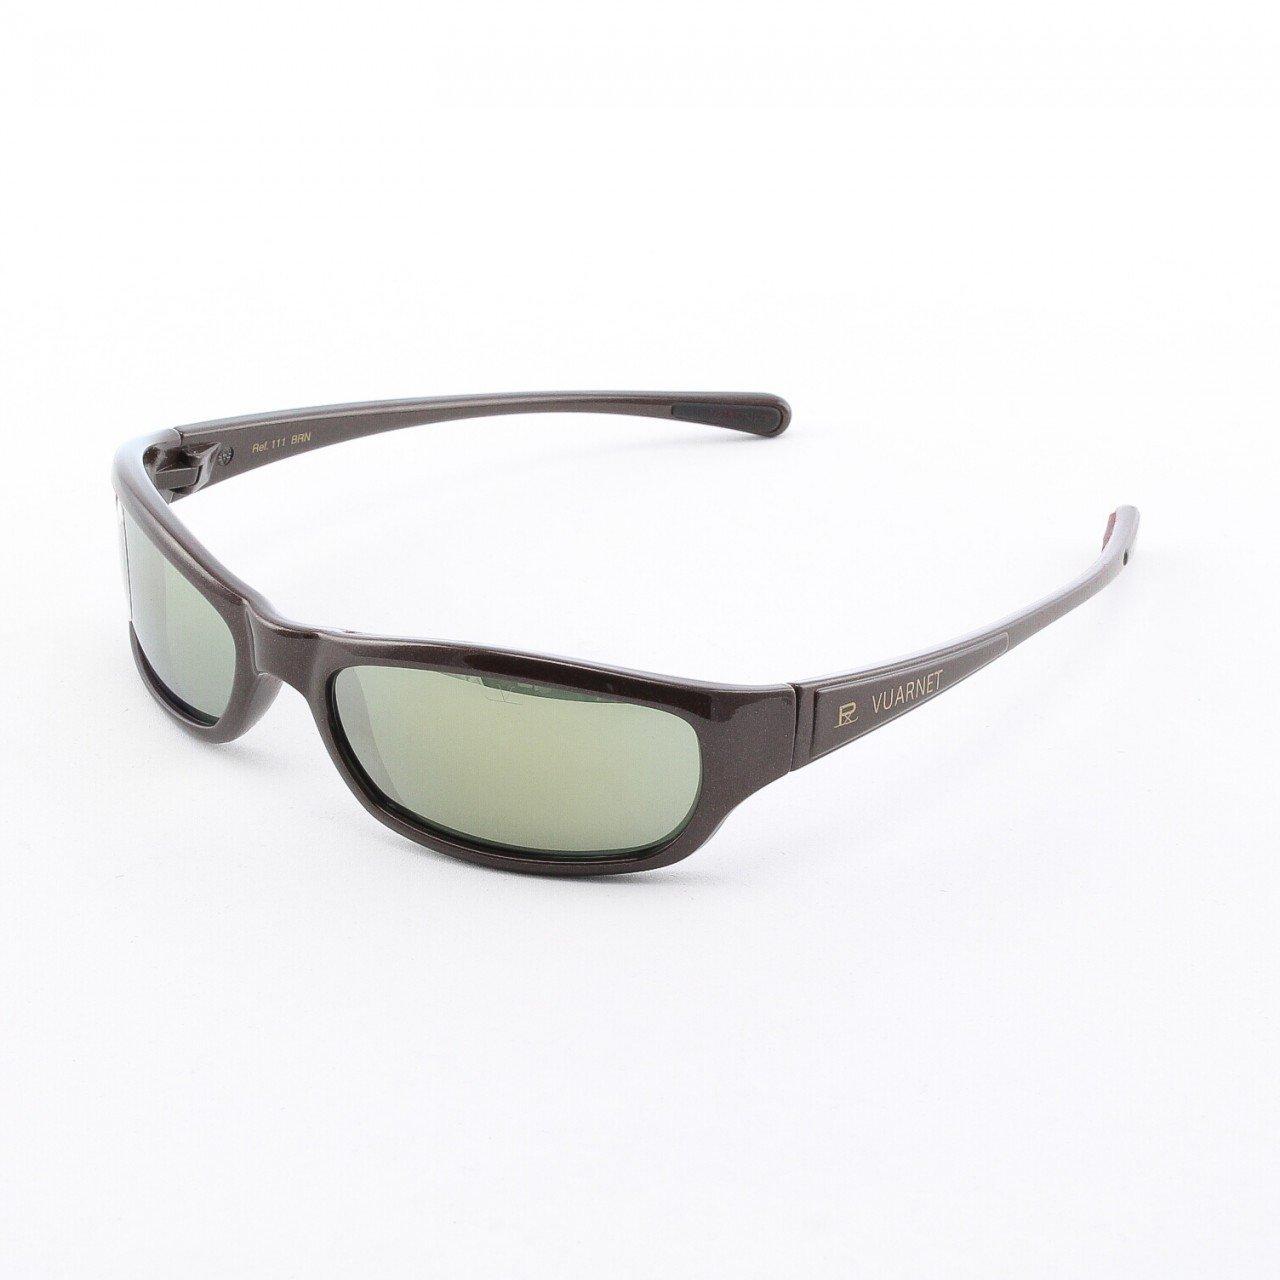 Vuarnet 111 BRNFB Uni Sunglasses Col. Brown with Grey Based PX3000 Lenses